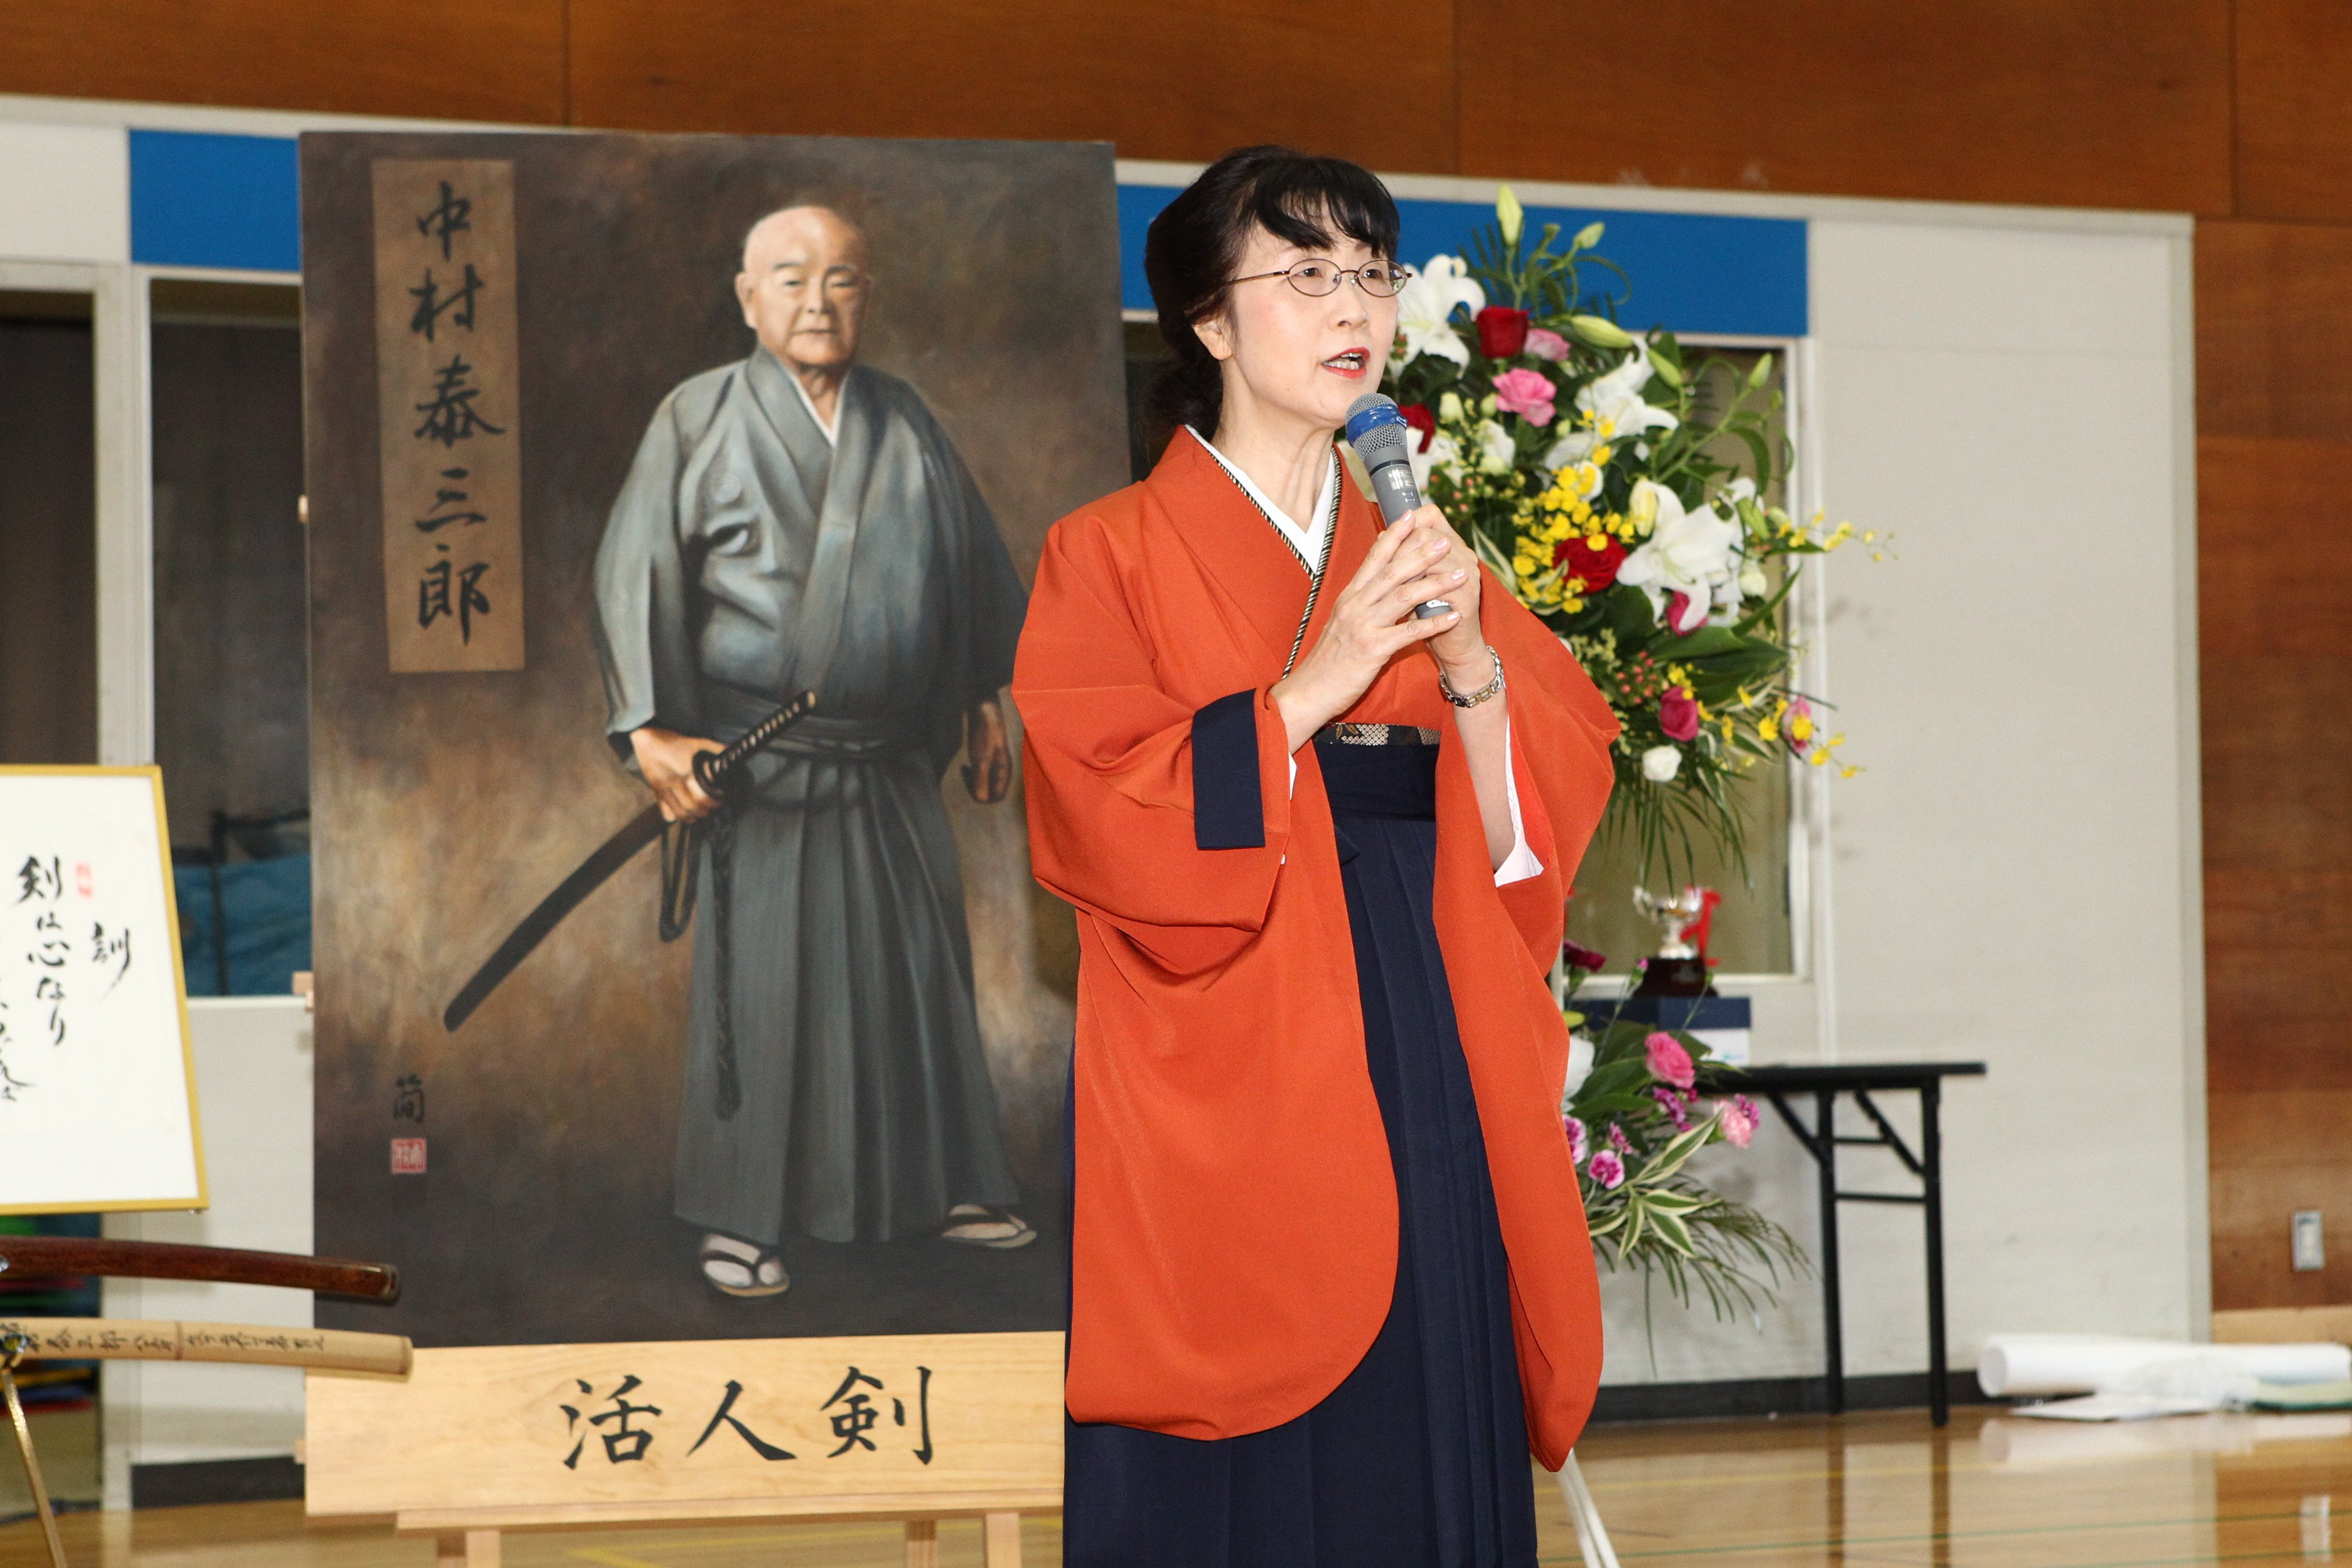 Nakamura Tomoko Kaichou giving opening remarks.